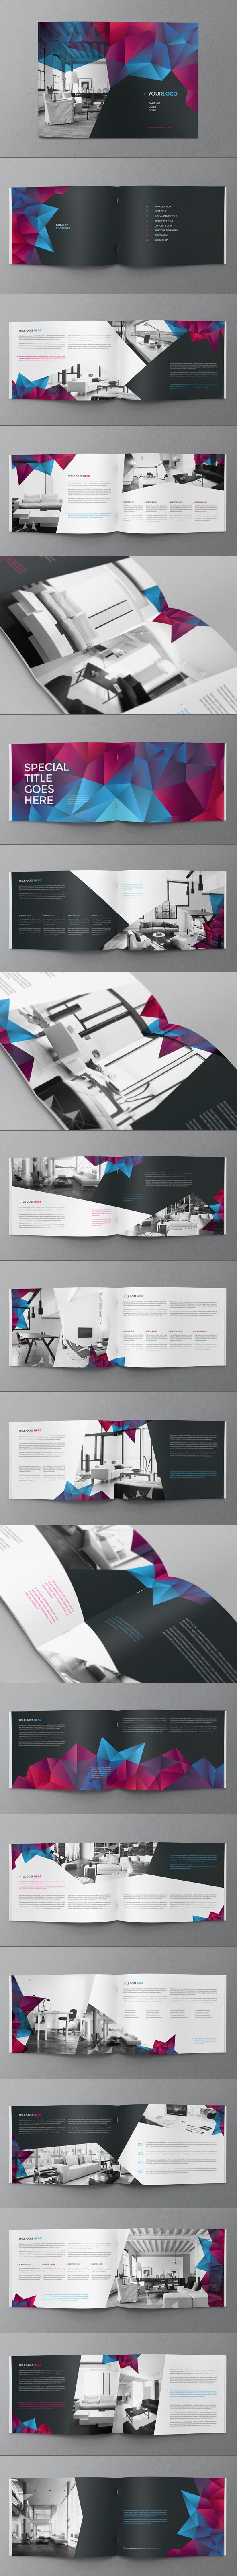 Cool Modern Brochure by Abra Design, via Behance